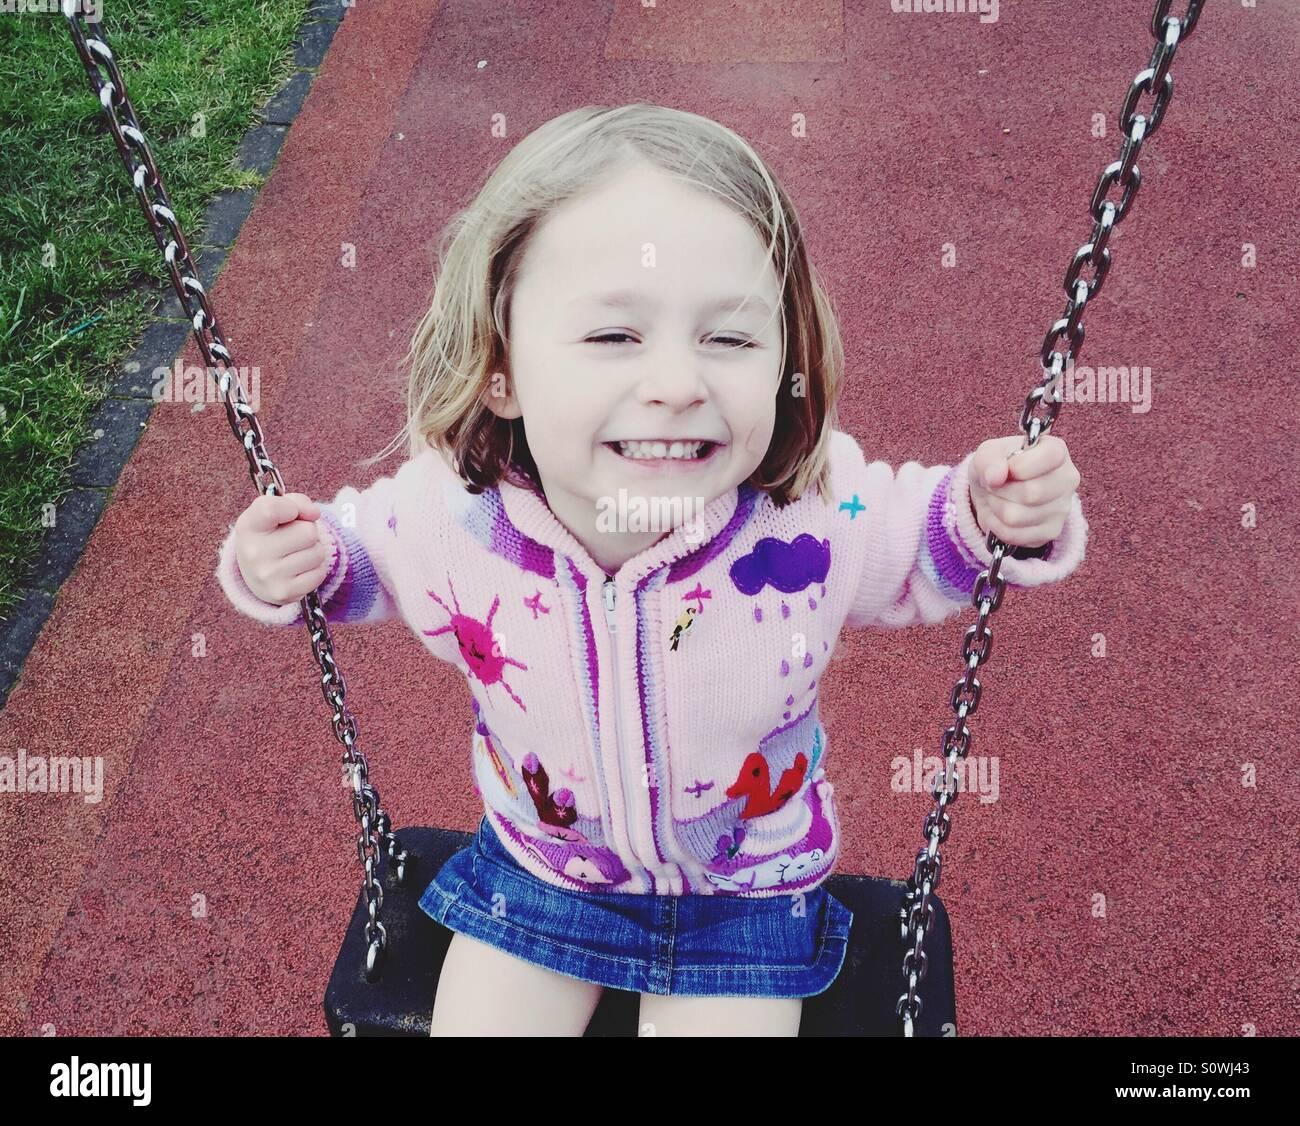 Swinging fun pics